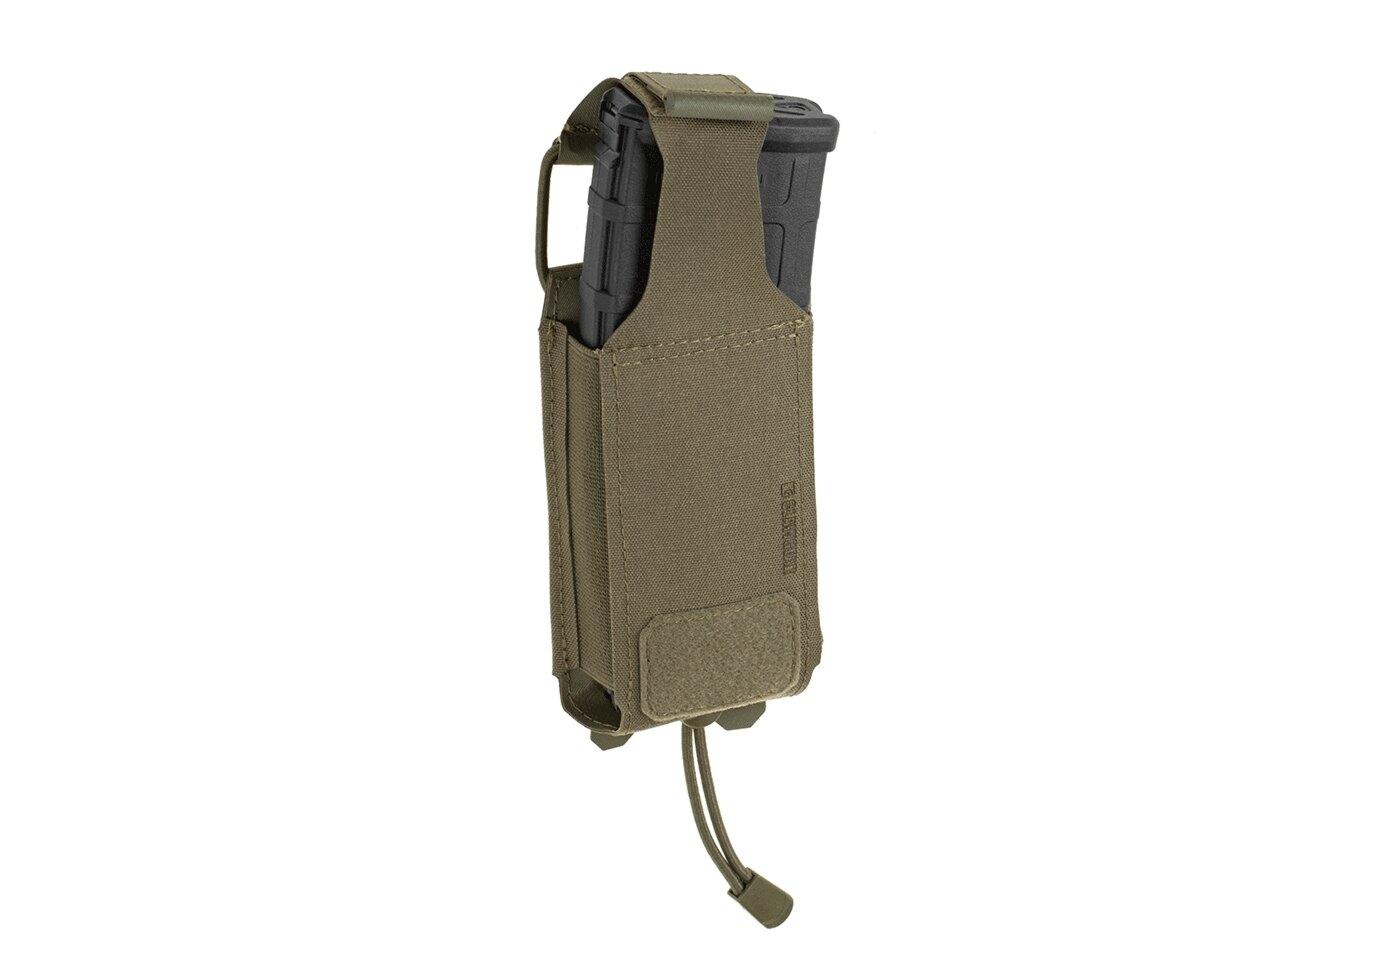 Sumka na zásobník 5,56 mm CLAWGEAR® - RAL7013 (Farba: RAL7013)